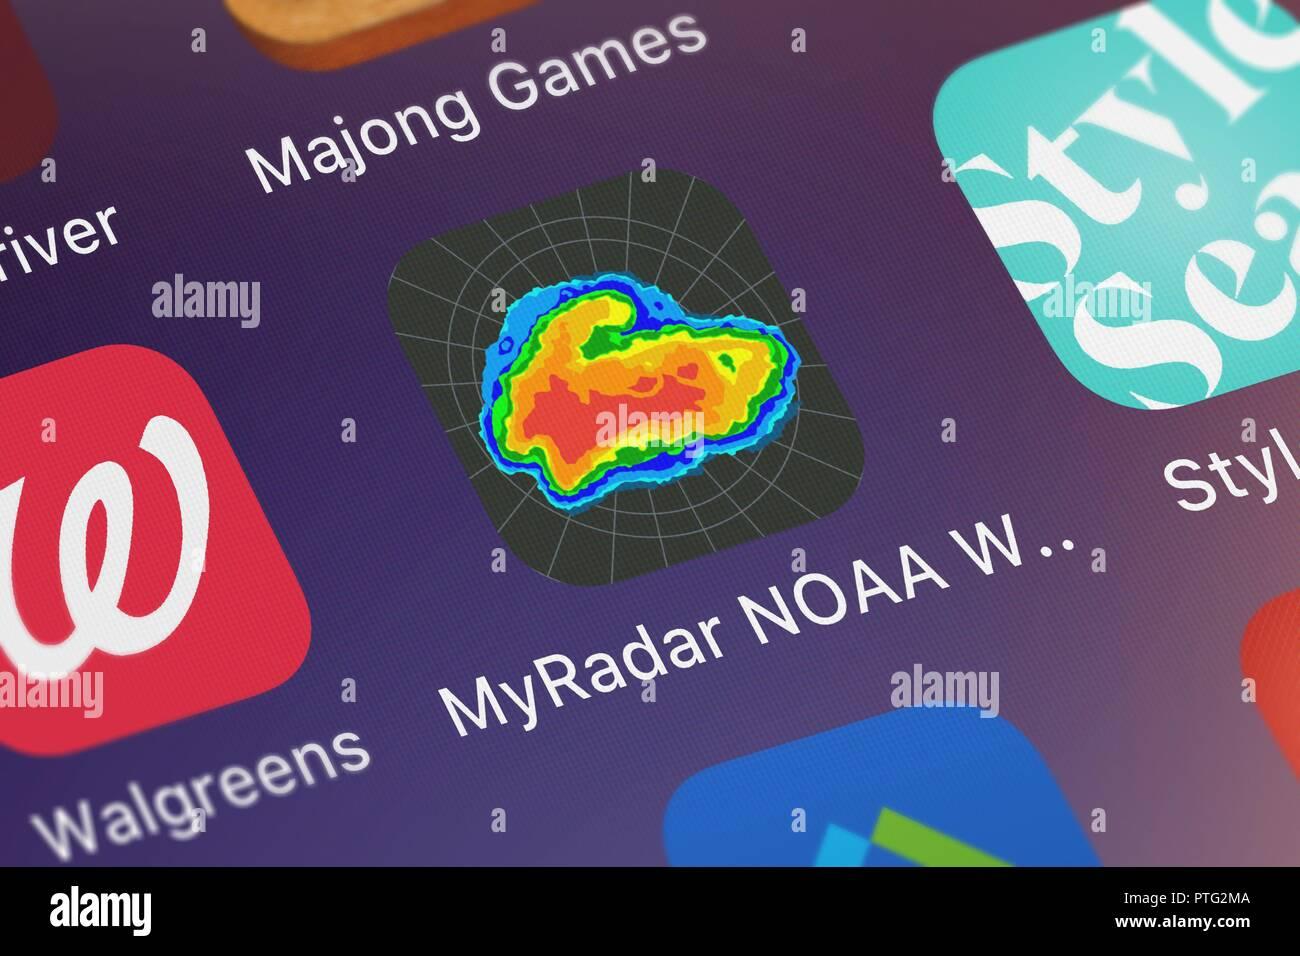 London, United Kingdom - October 09, 2018: The MyRadar NOAA